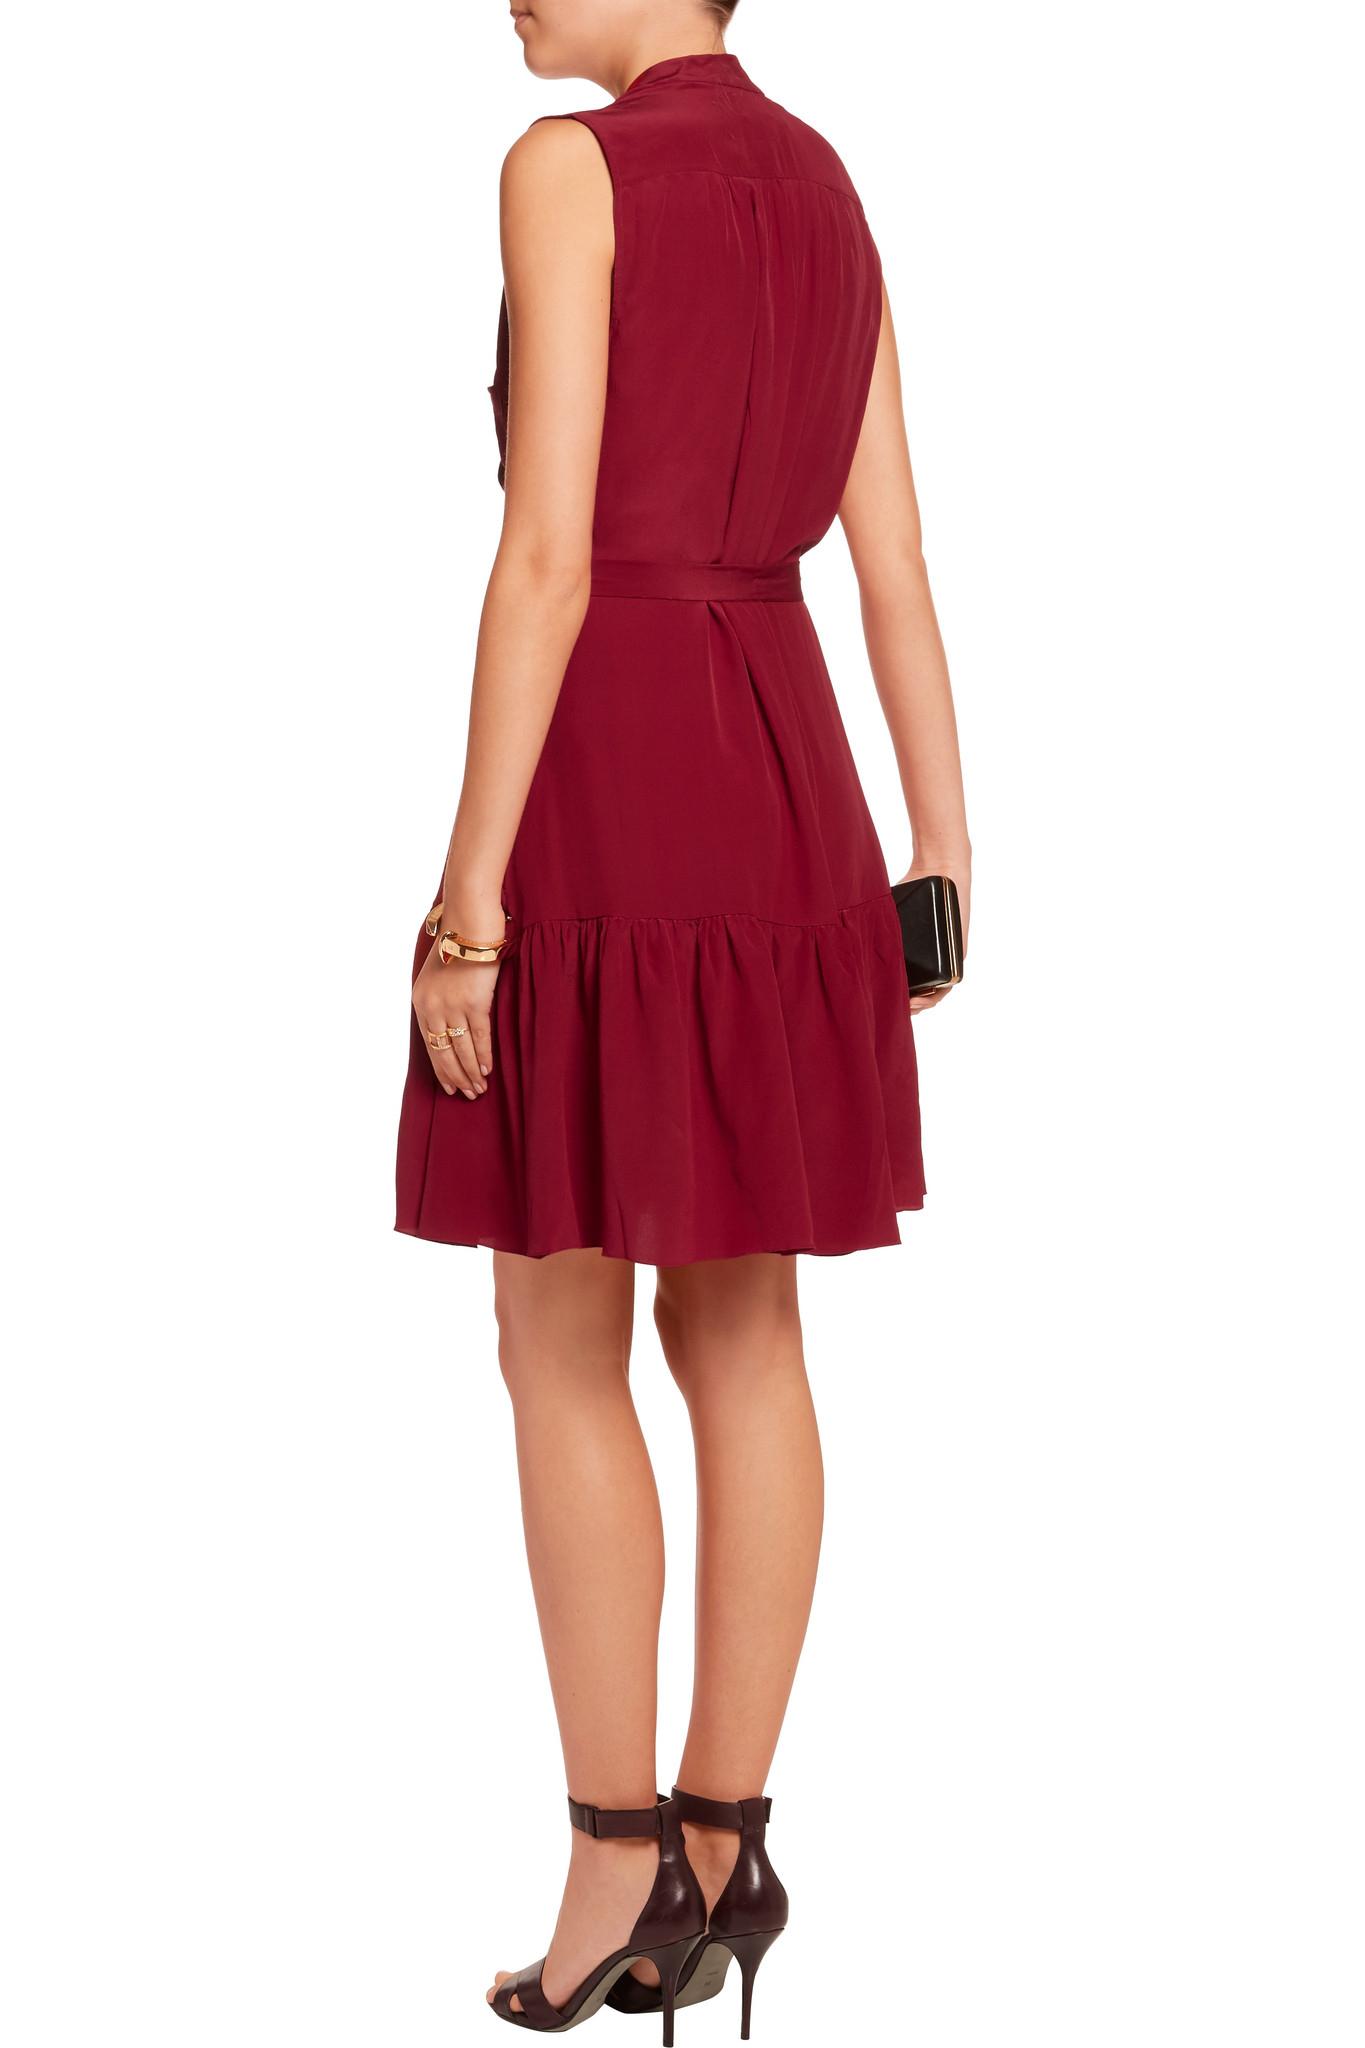 lyst saloni tilly silk crepe de chine dress in red. Black Bedroom Furniture Sets. Home Design Ideas